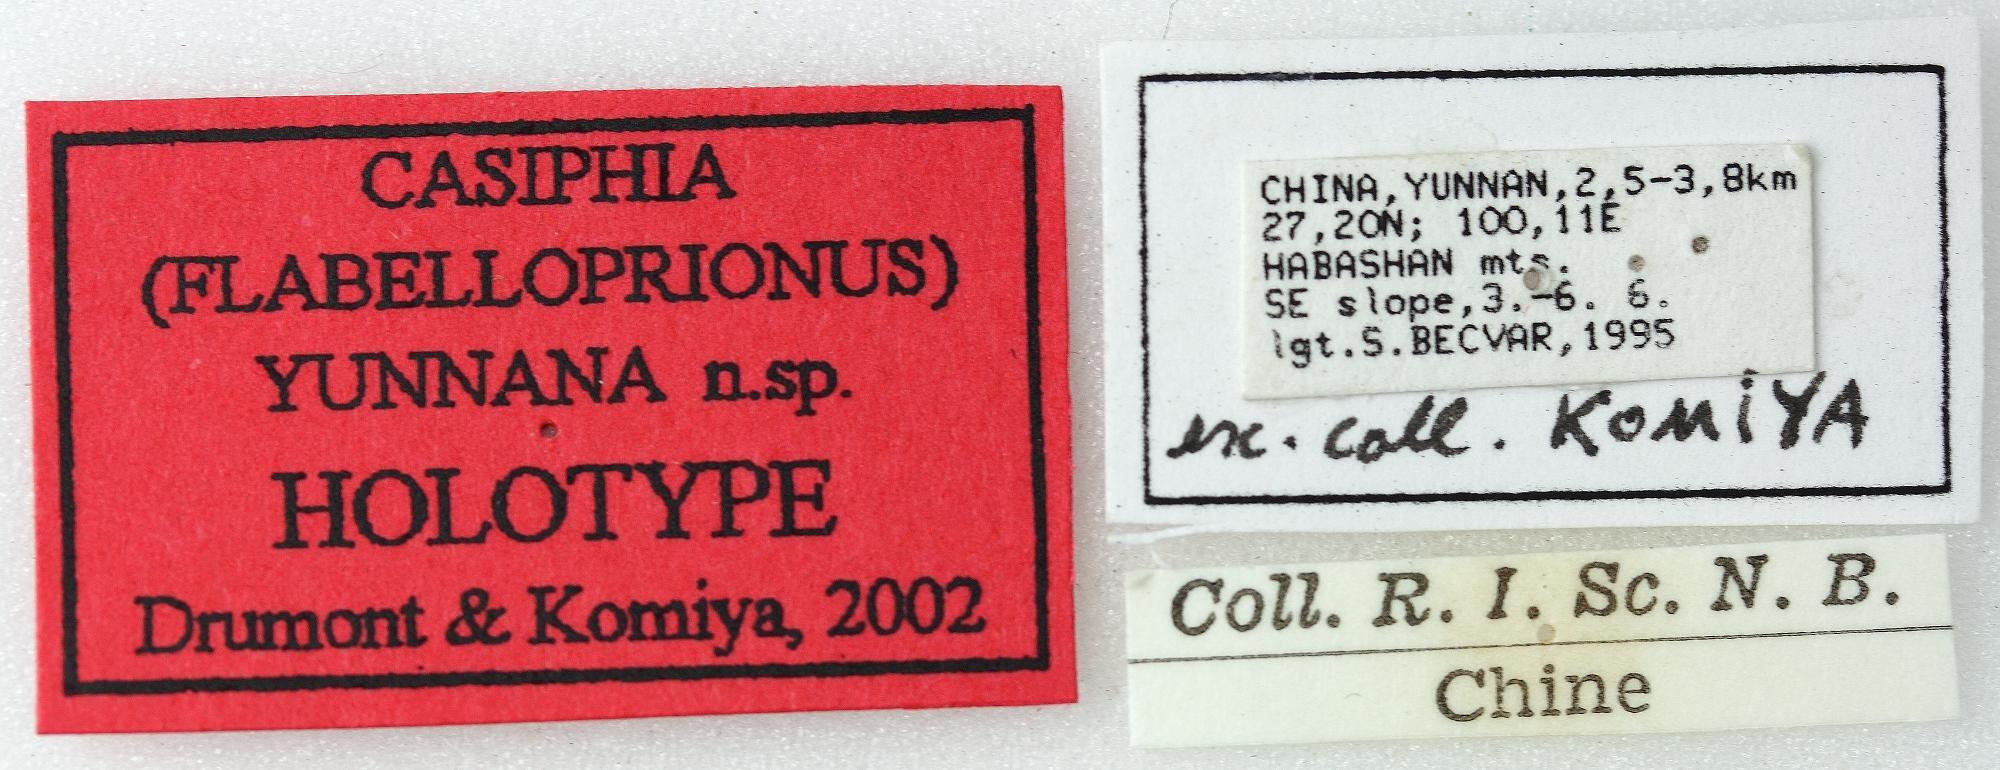 Casiphia yunnana 01 00 Holotype M 025 BRUS 201405.jpg